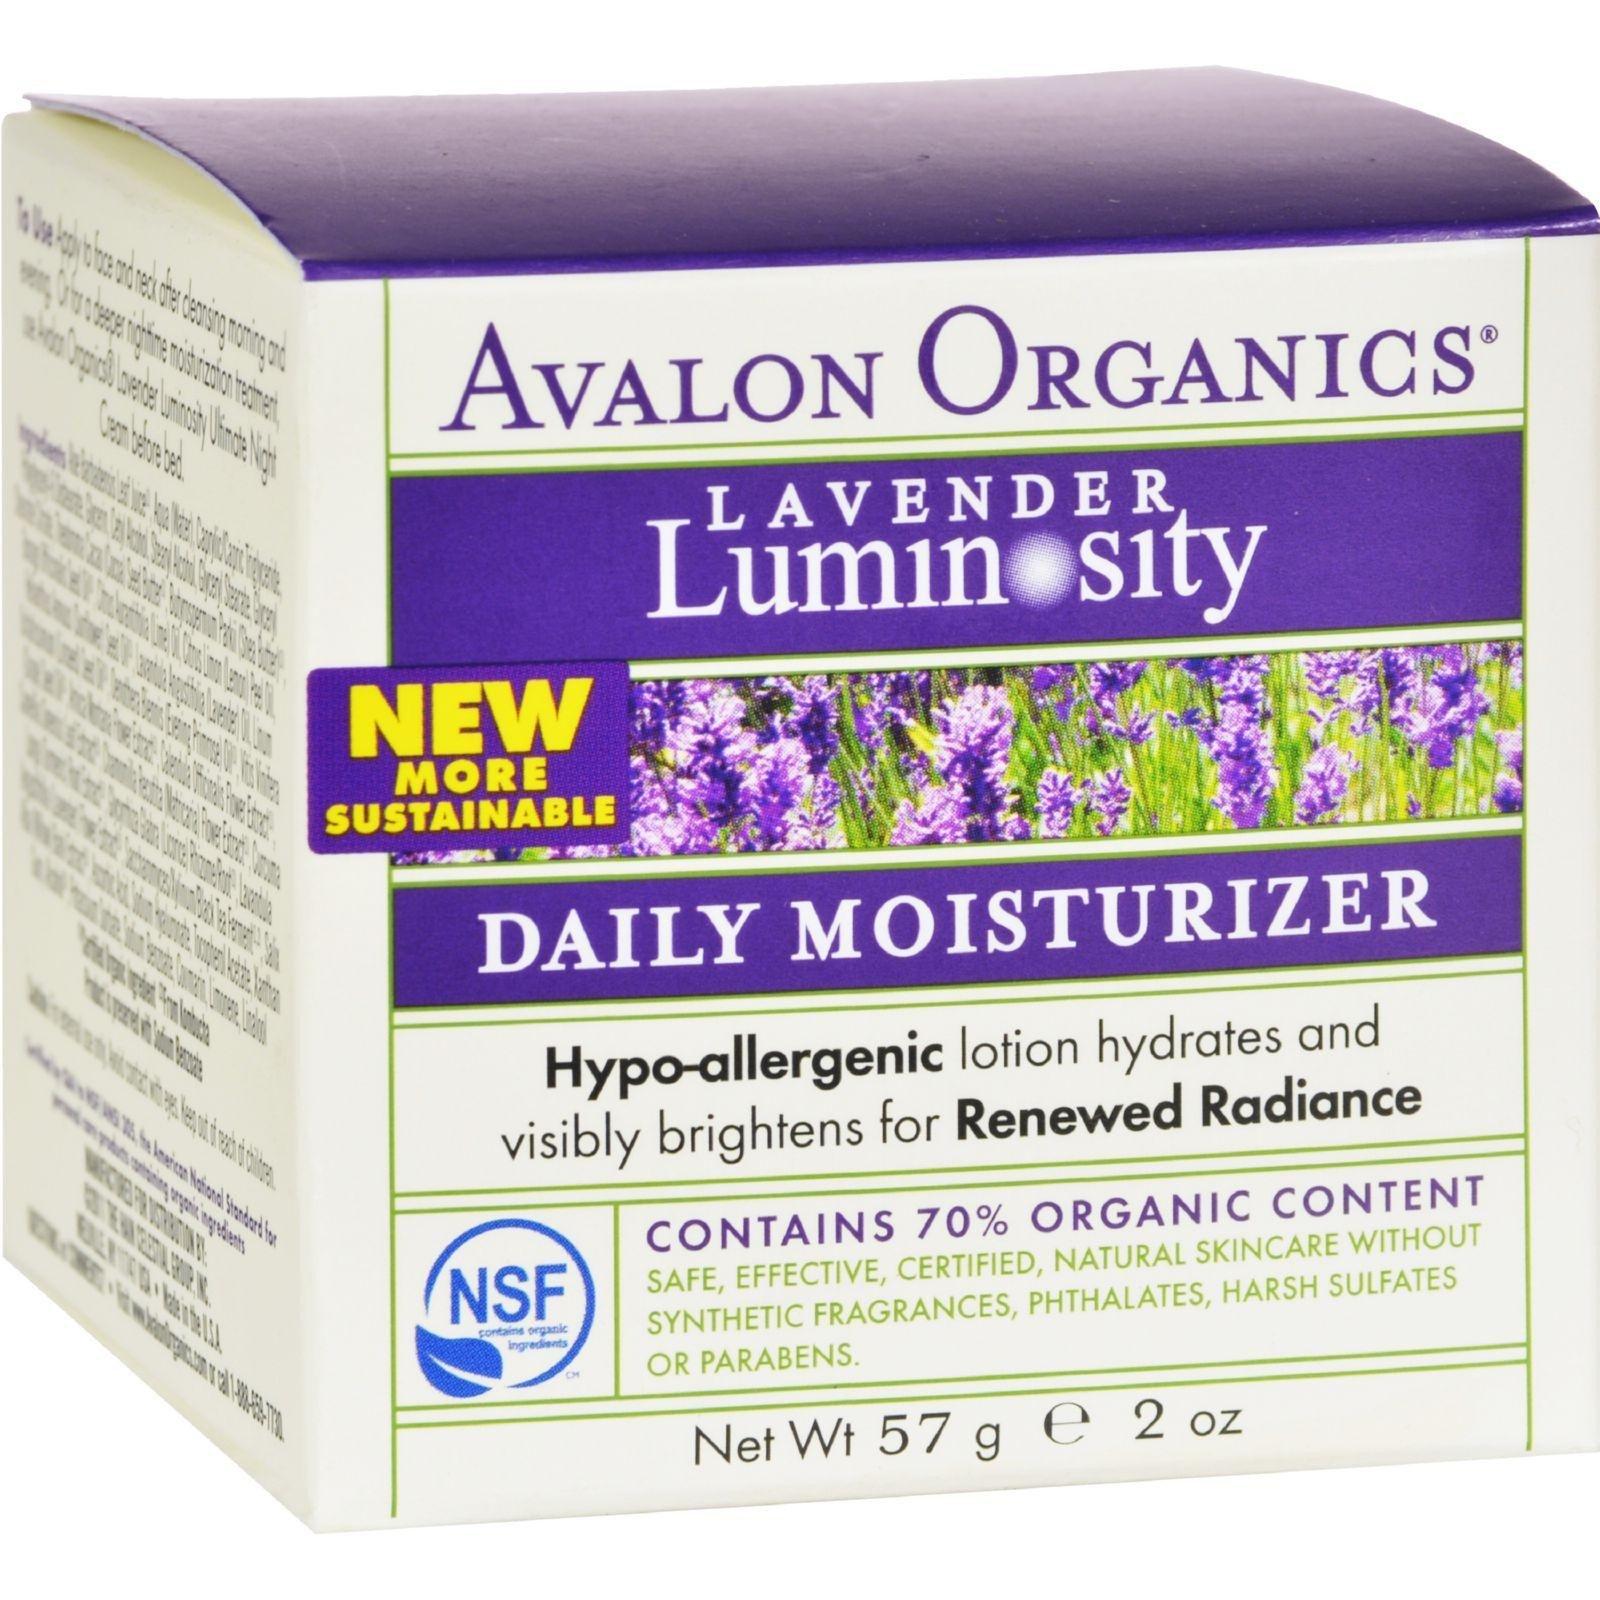 Avalon Organics Daily Moisturizer Lavender - 2 Fl Oz